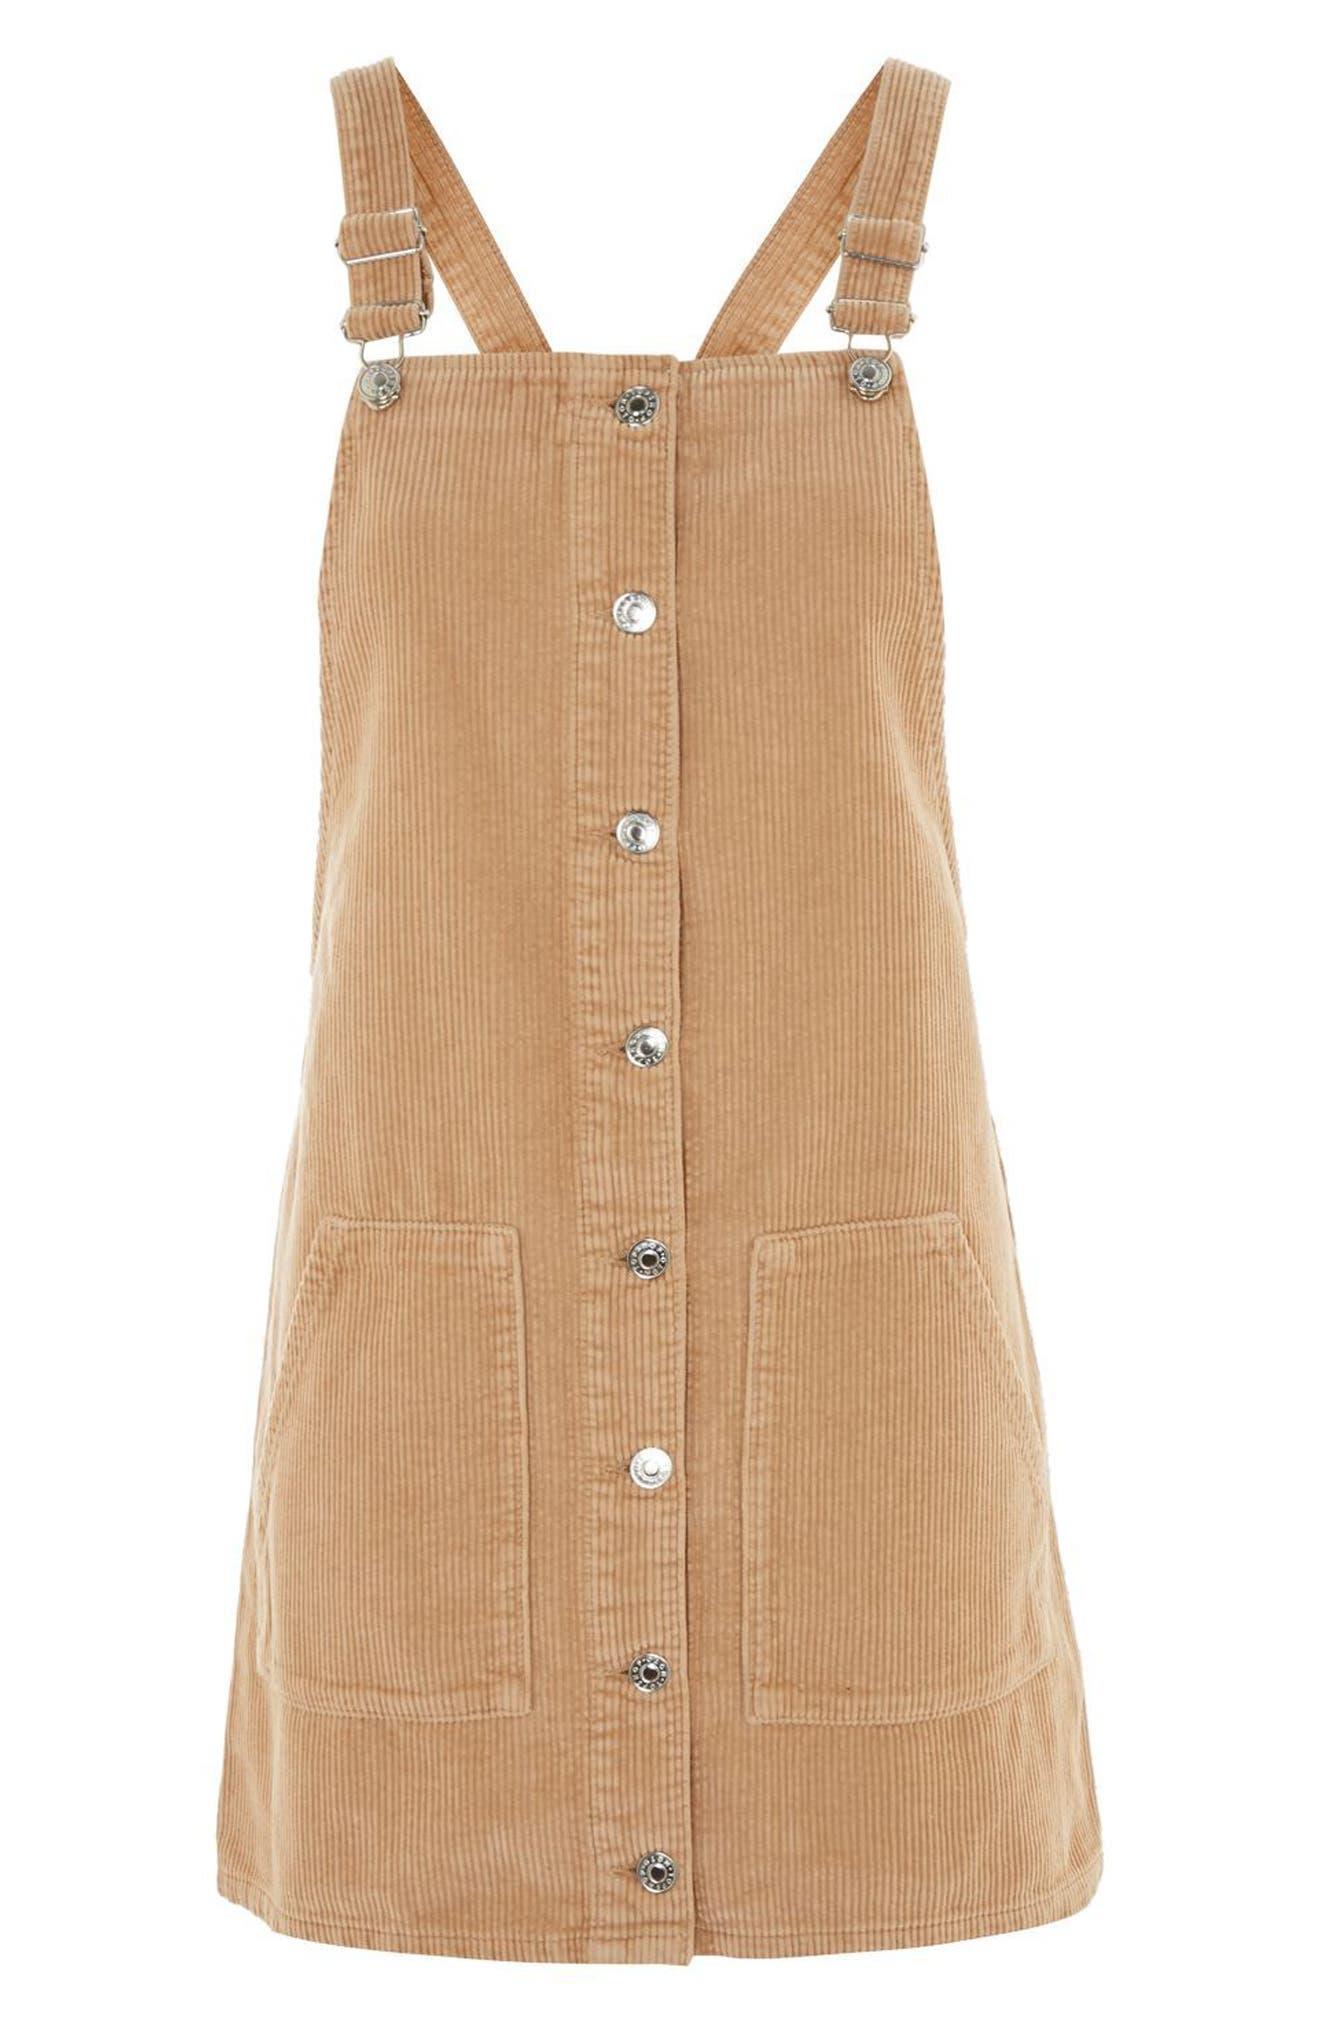 Button Front Corduroy Pinafore Dress,                             Alternate thumbnail 4, color,                             Stone